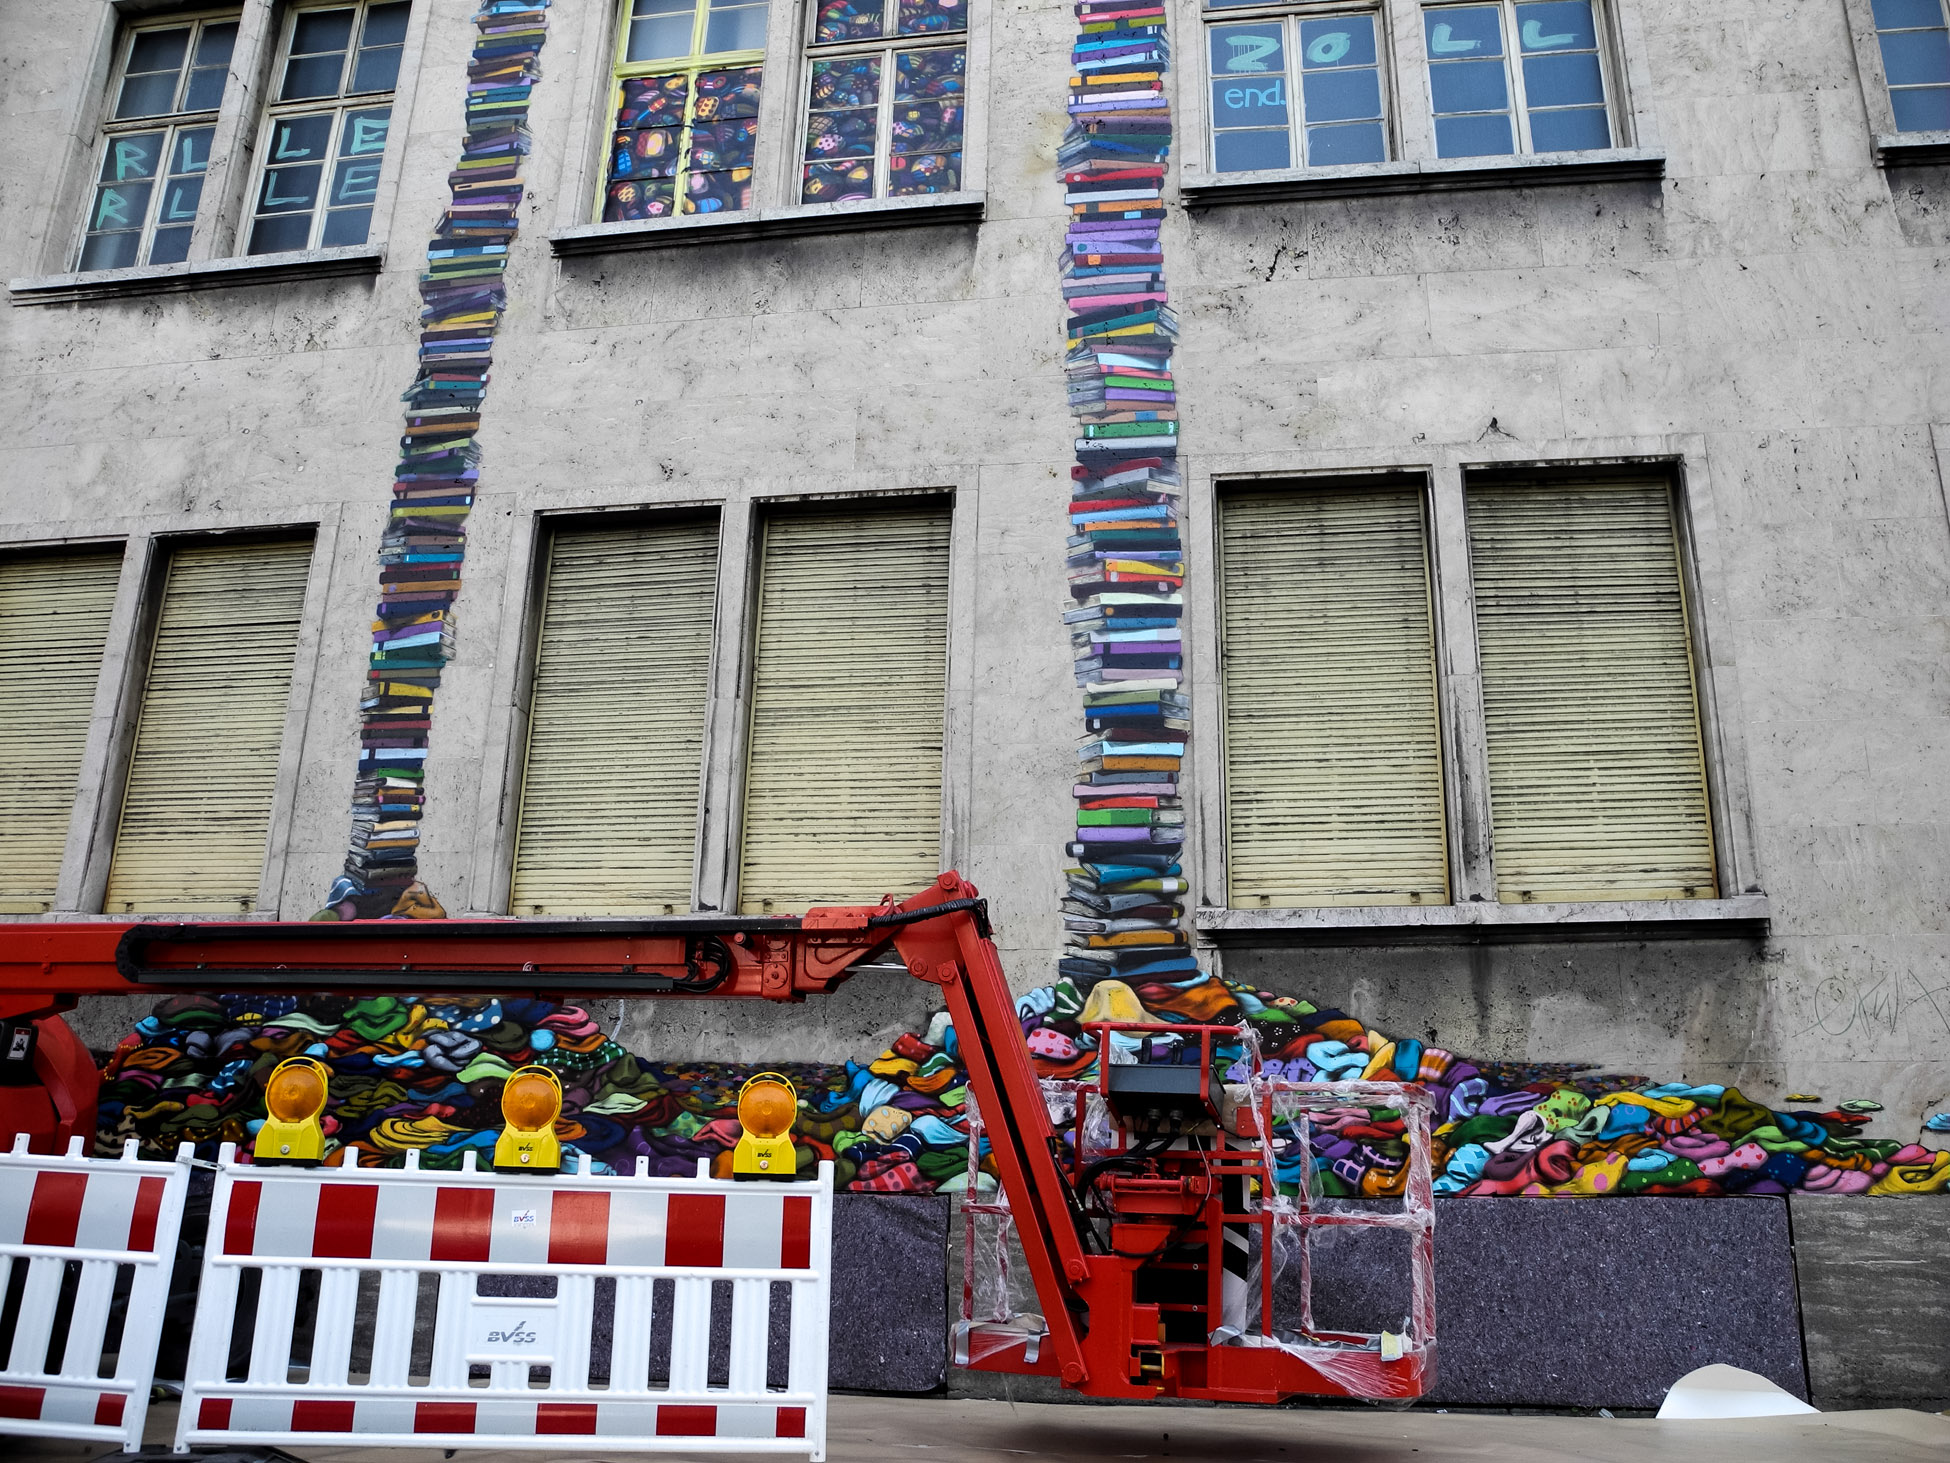 Streetart_Brazil_Tinho_2013_Frankfurt (6 von 6)